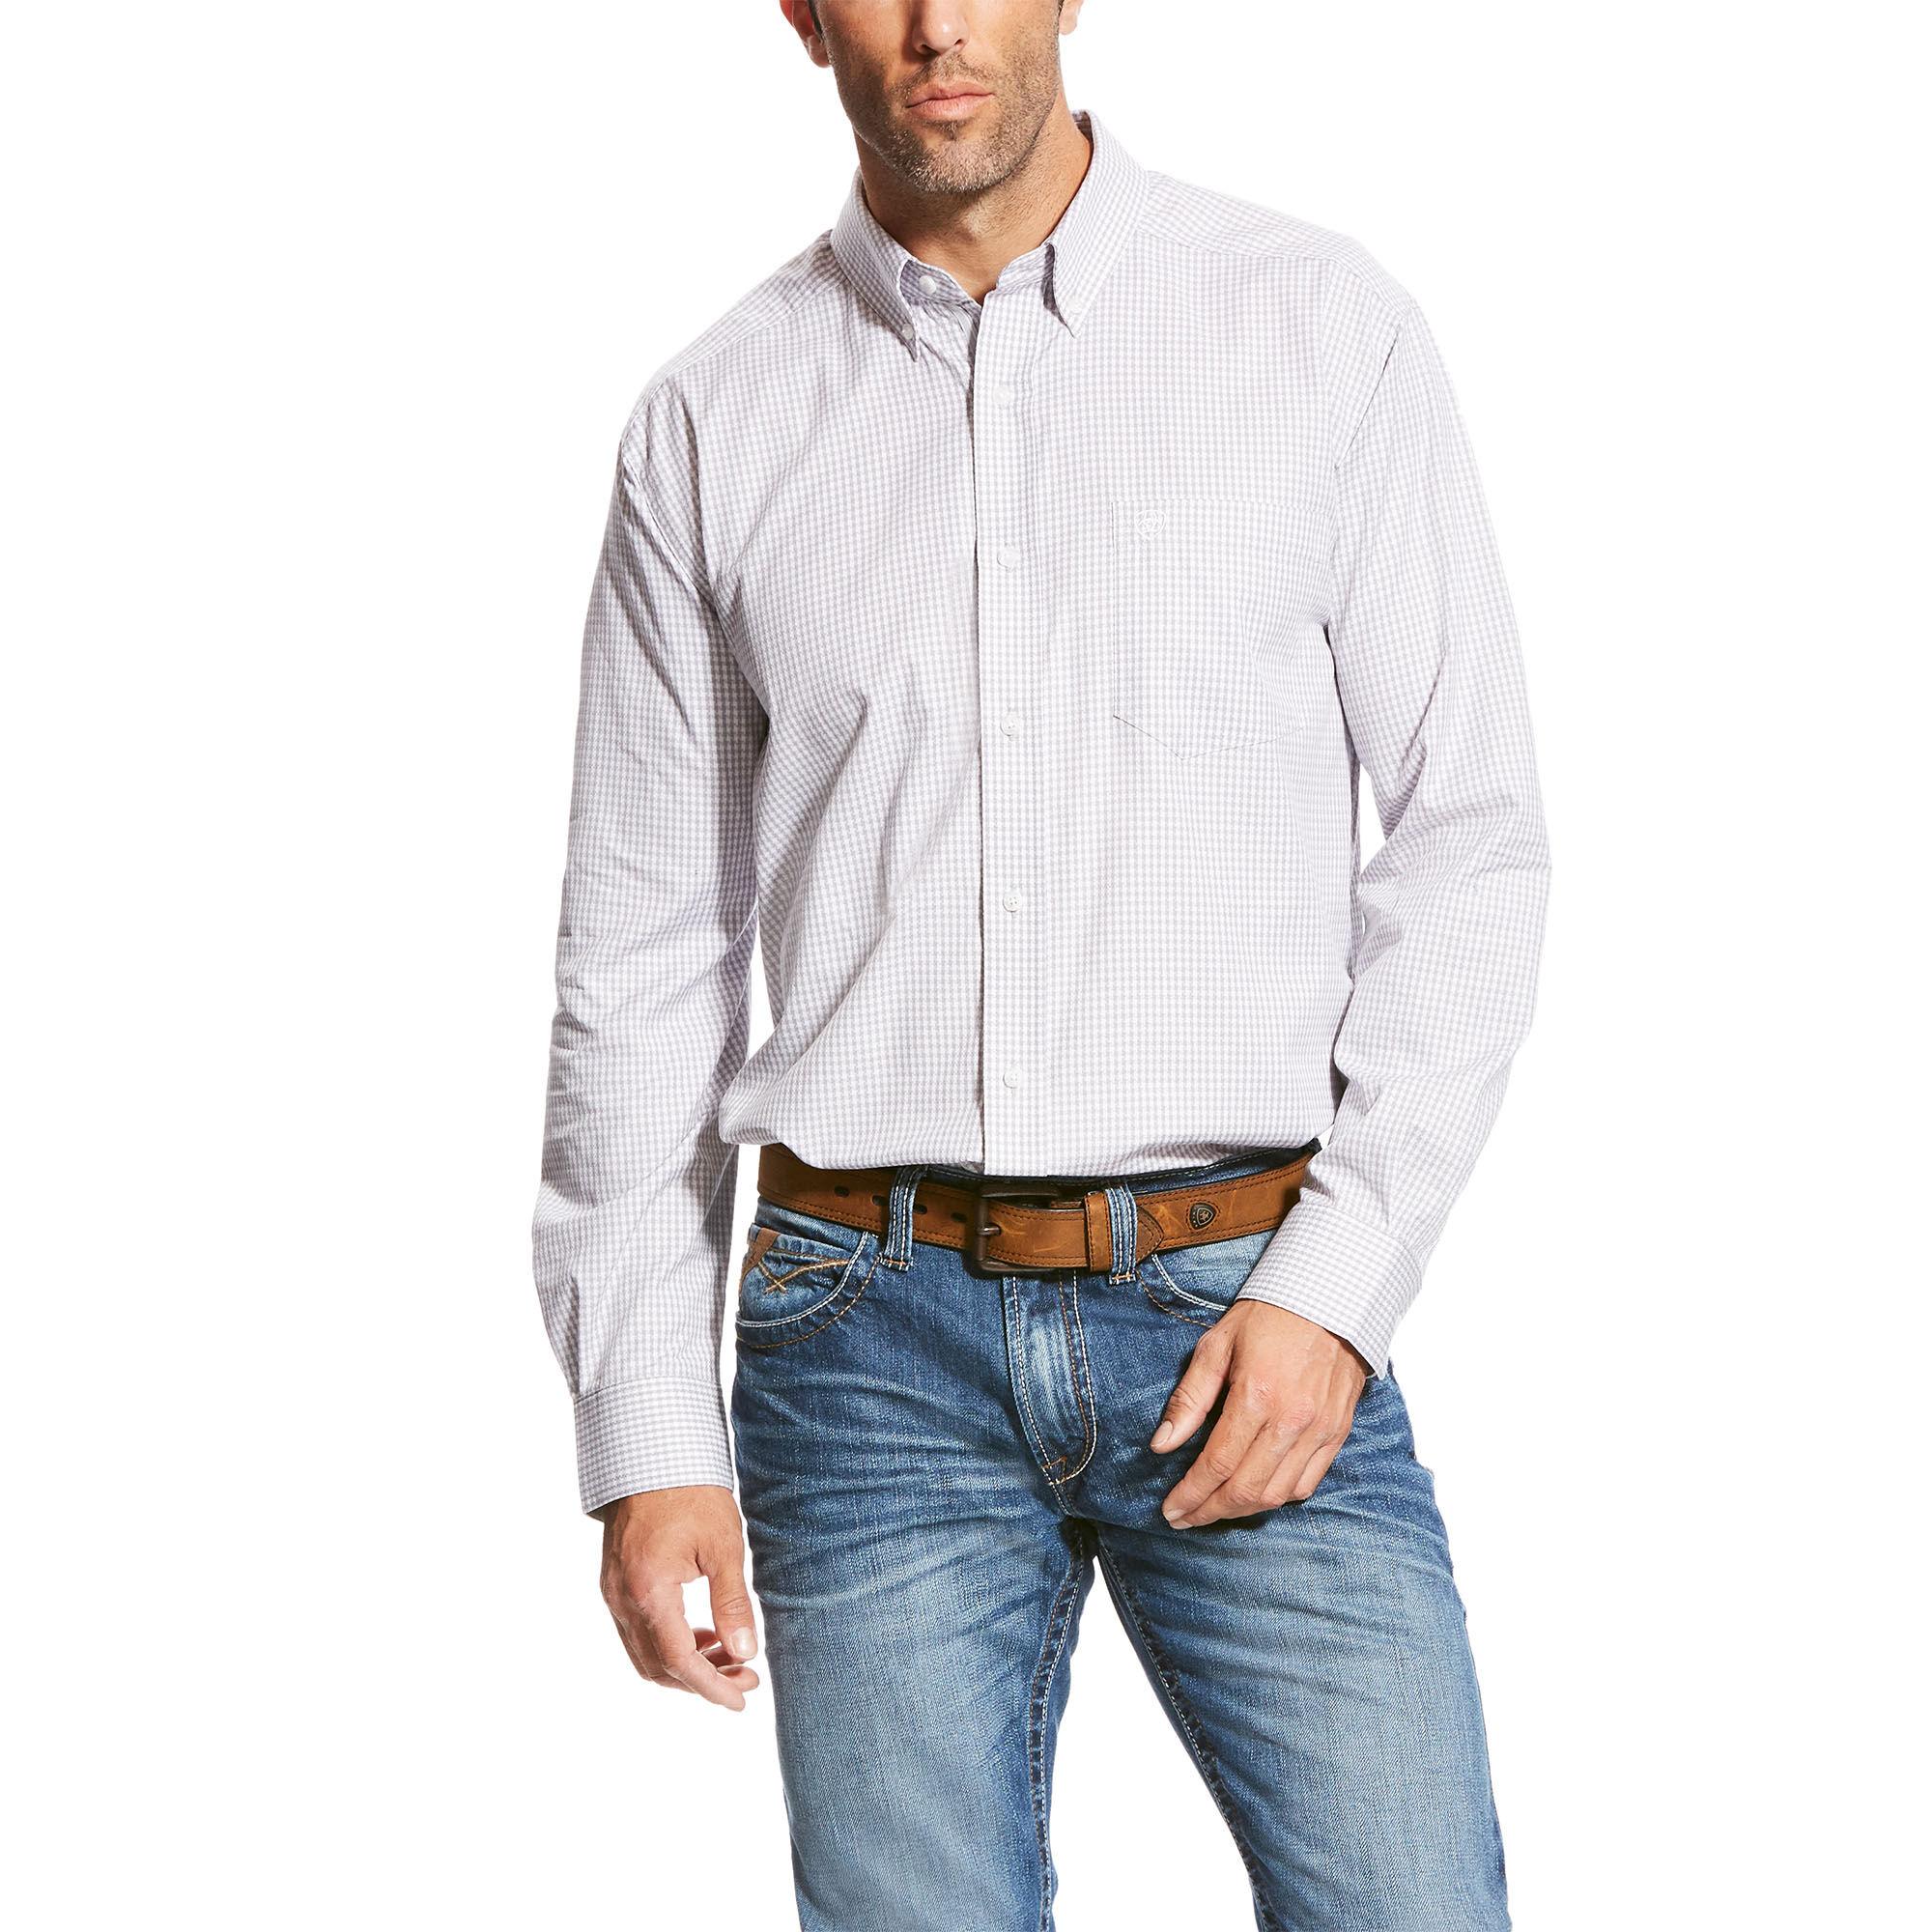 Pro Series Pacheco Shirt